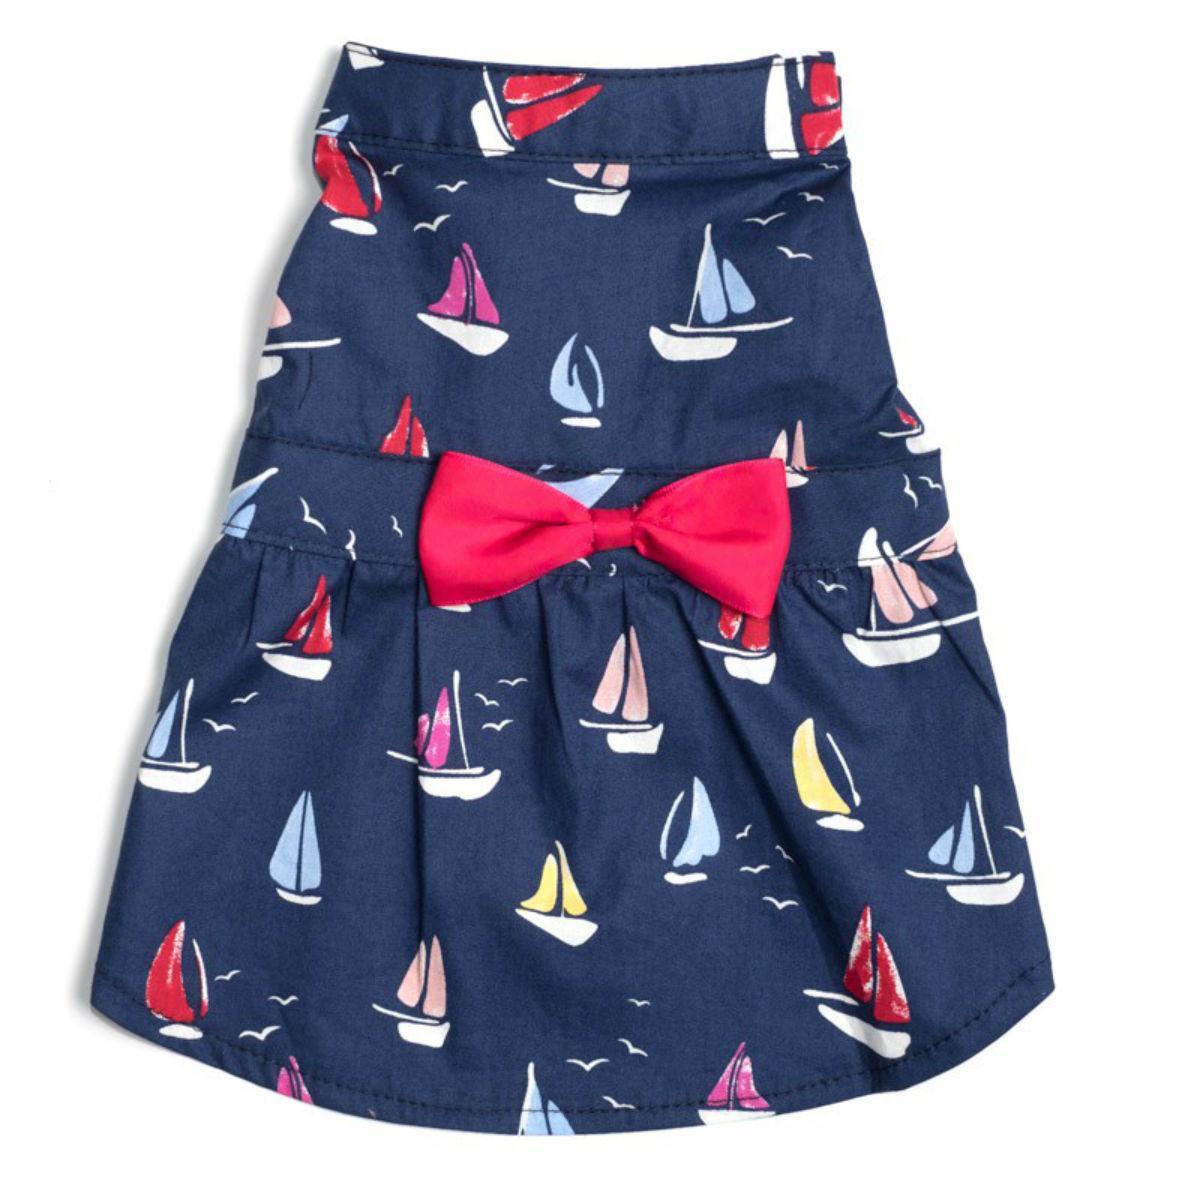 Worthy Dog Navy Sailboats Dog Dress